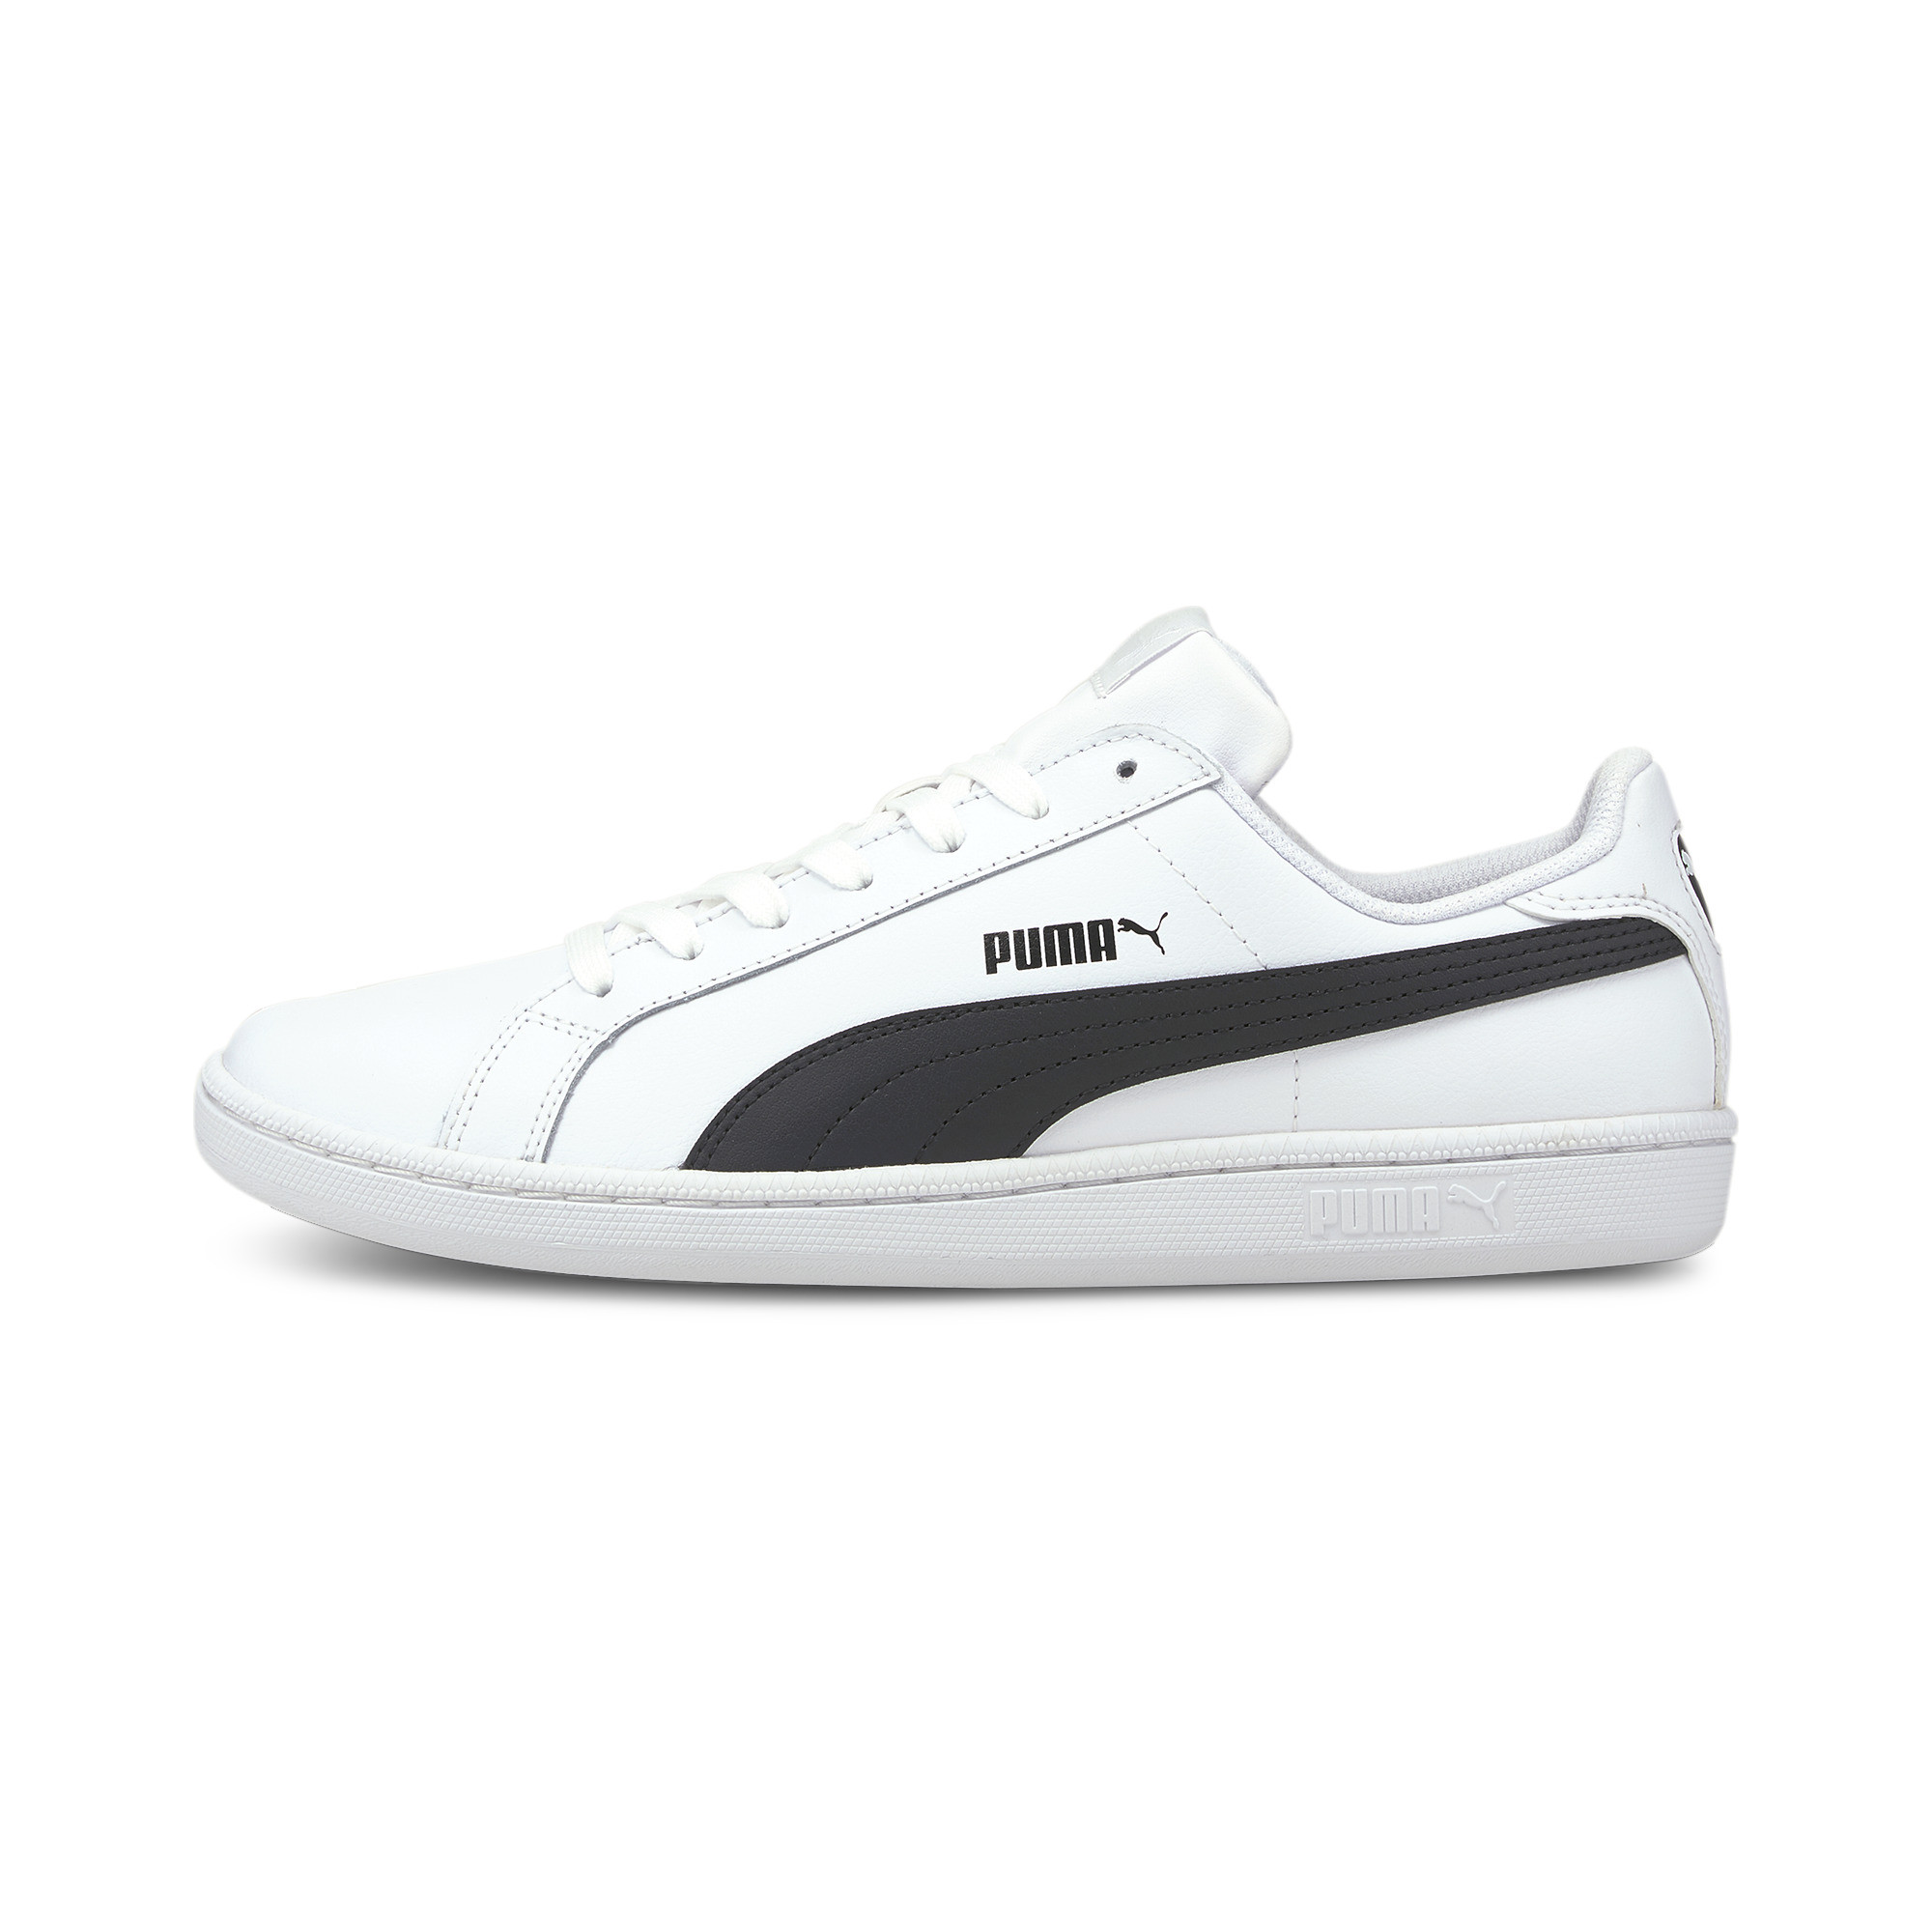 Indexbild 14 - PUMA Smash Trainers Schuhe Sneakers Sport Classics Unisex Neu